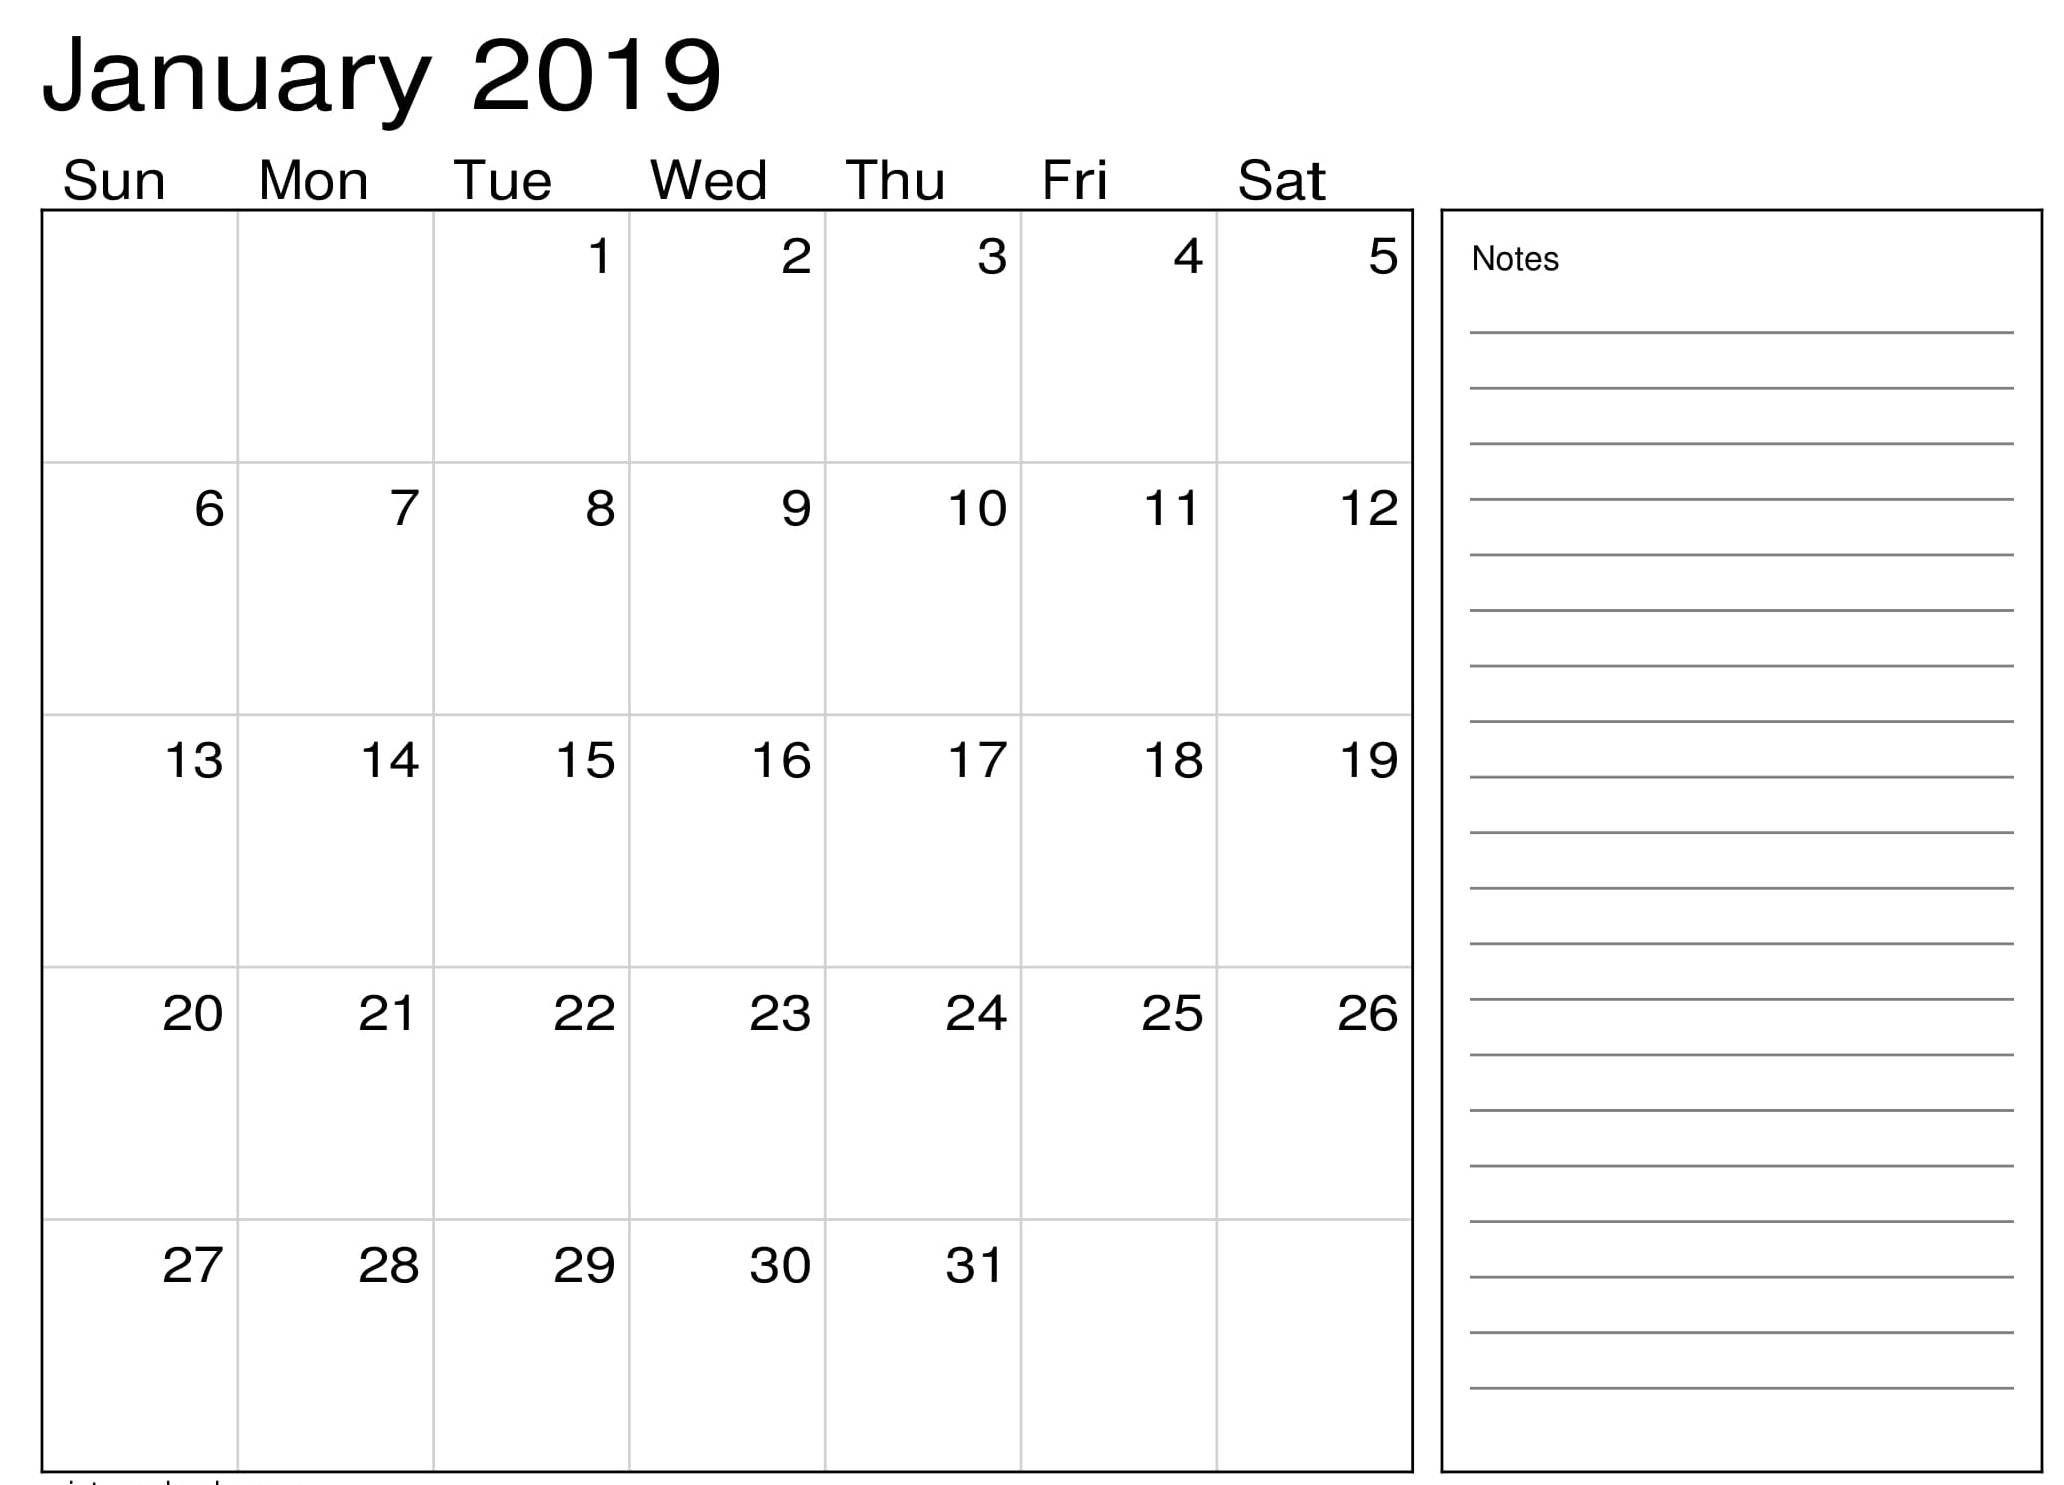 January 2019 Calendar Pdf August Calendar Calendar 2019